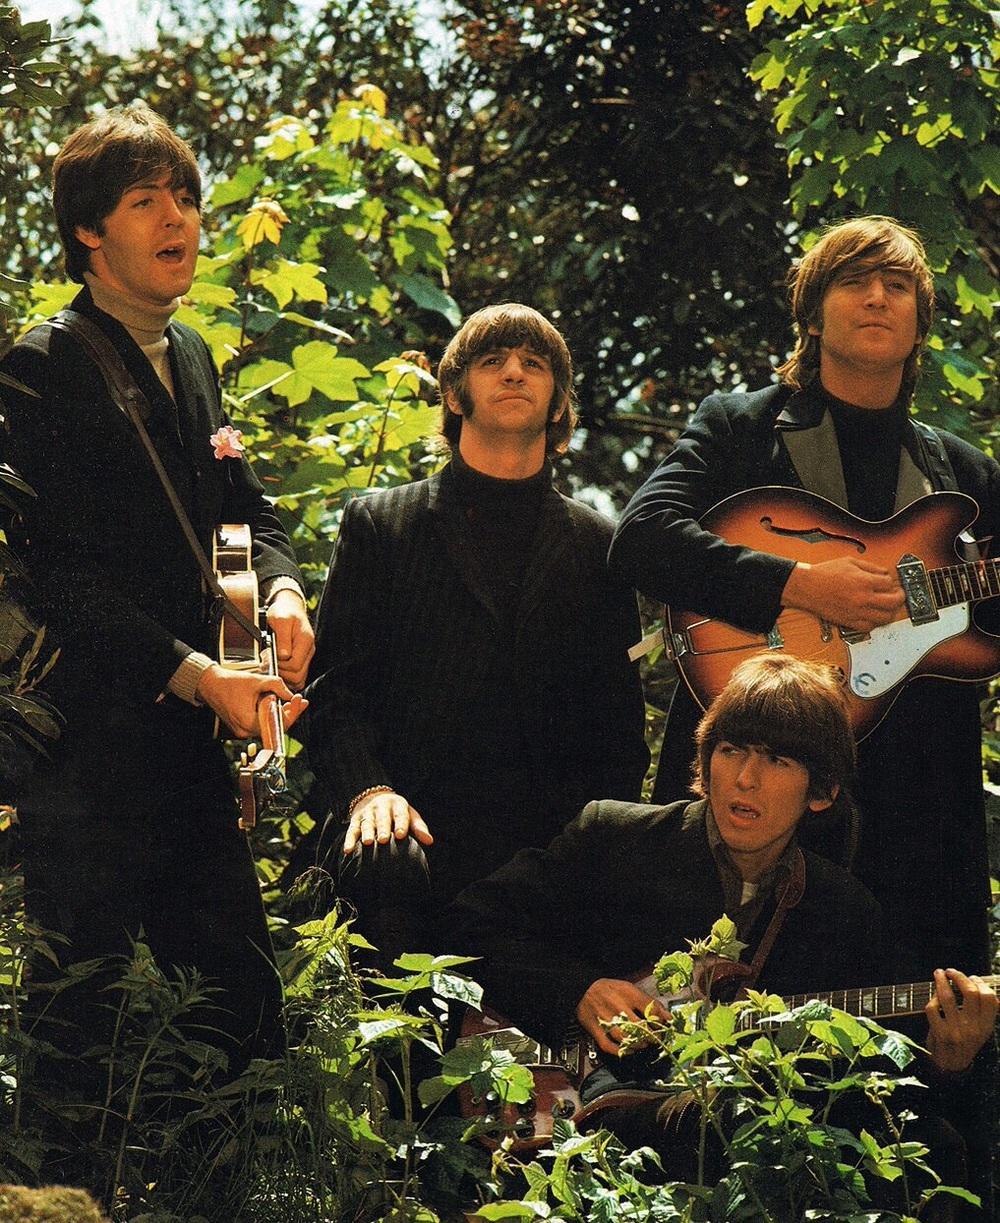 The Beatles at Chiswick House, May 20th, 1966.